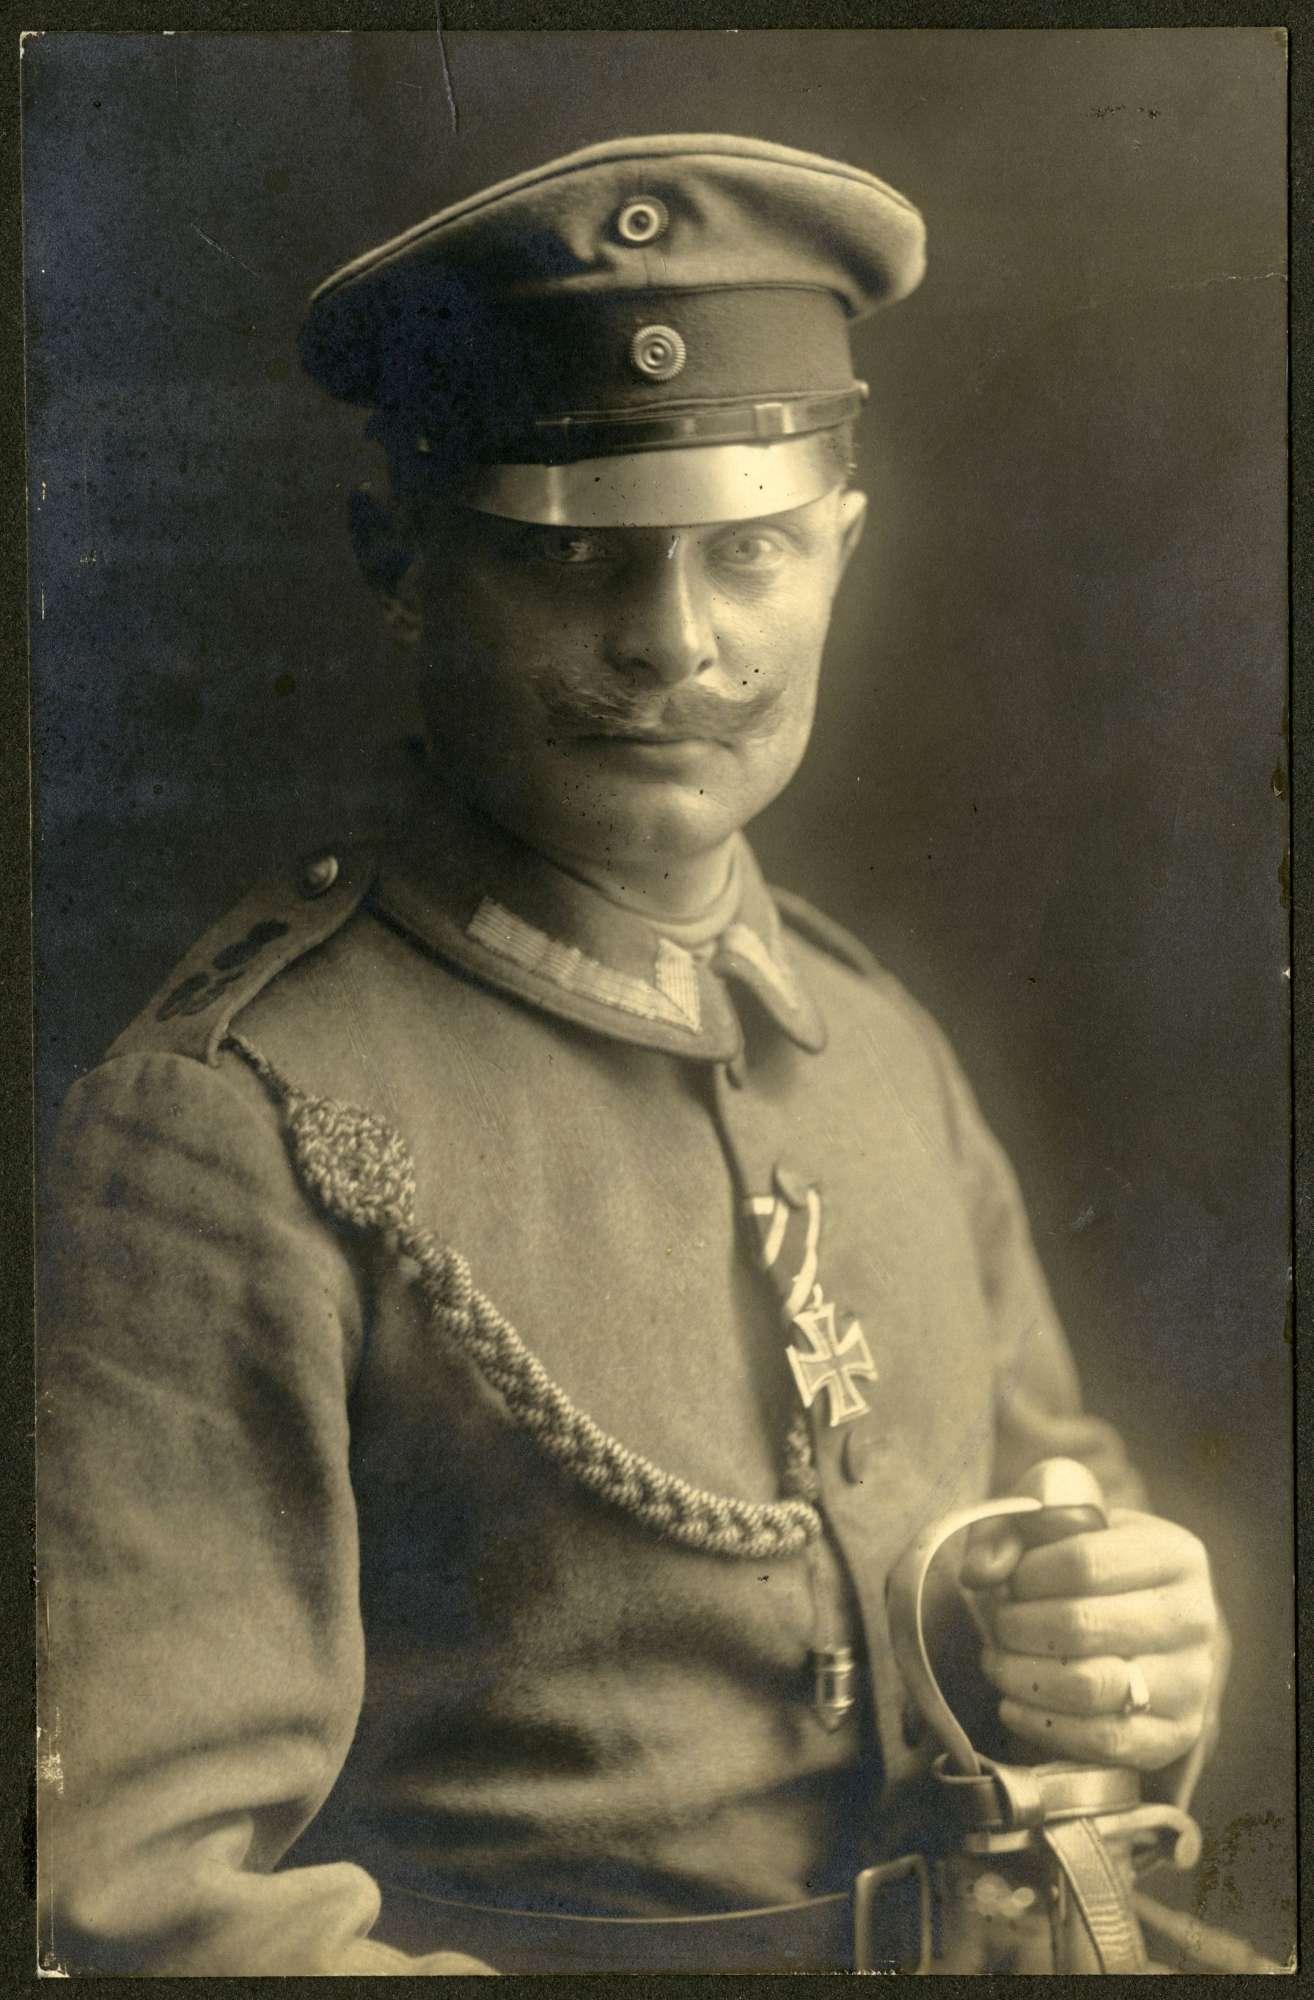 Storz, Albert, Bild 1